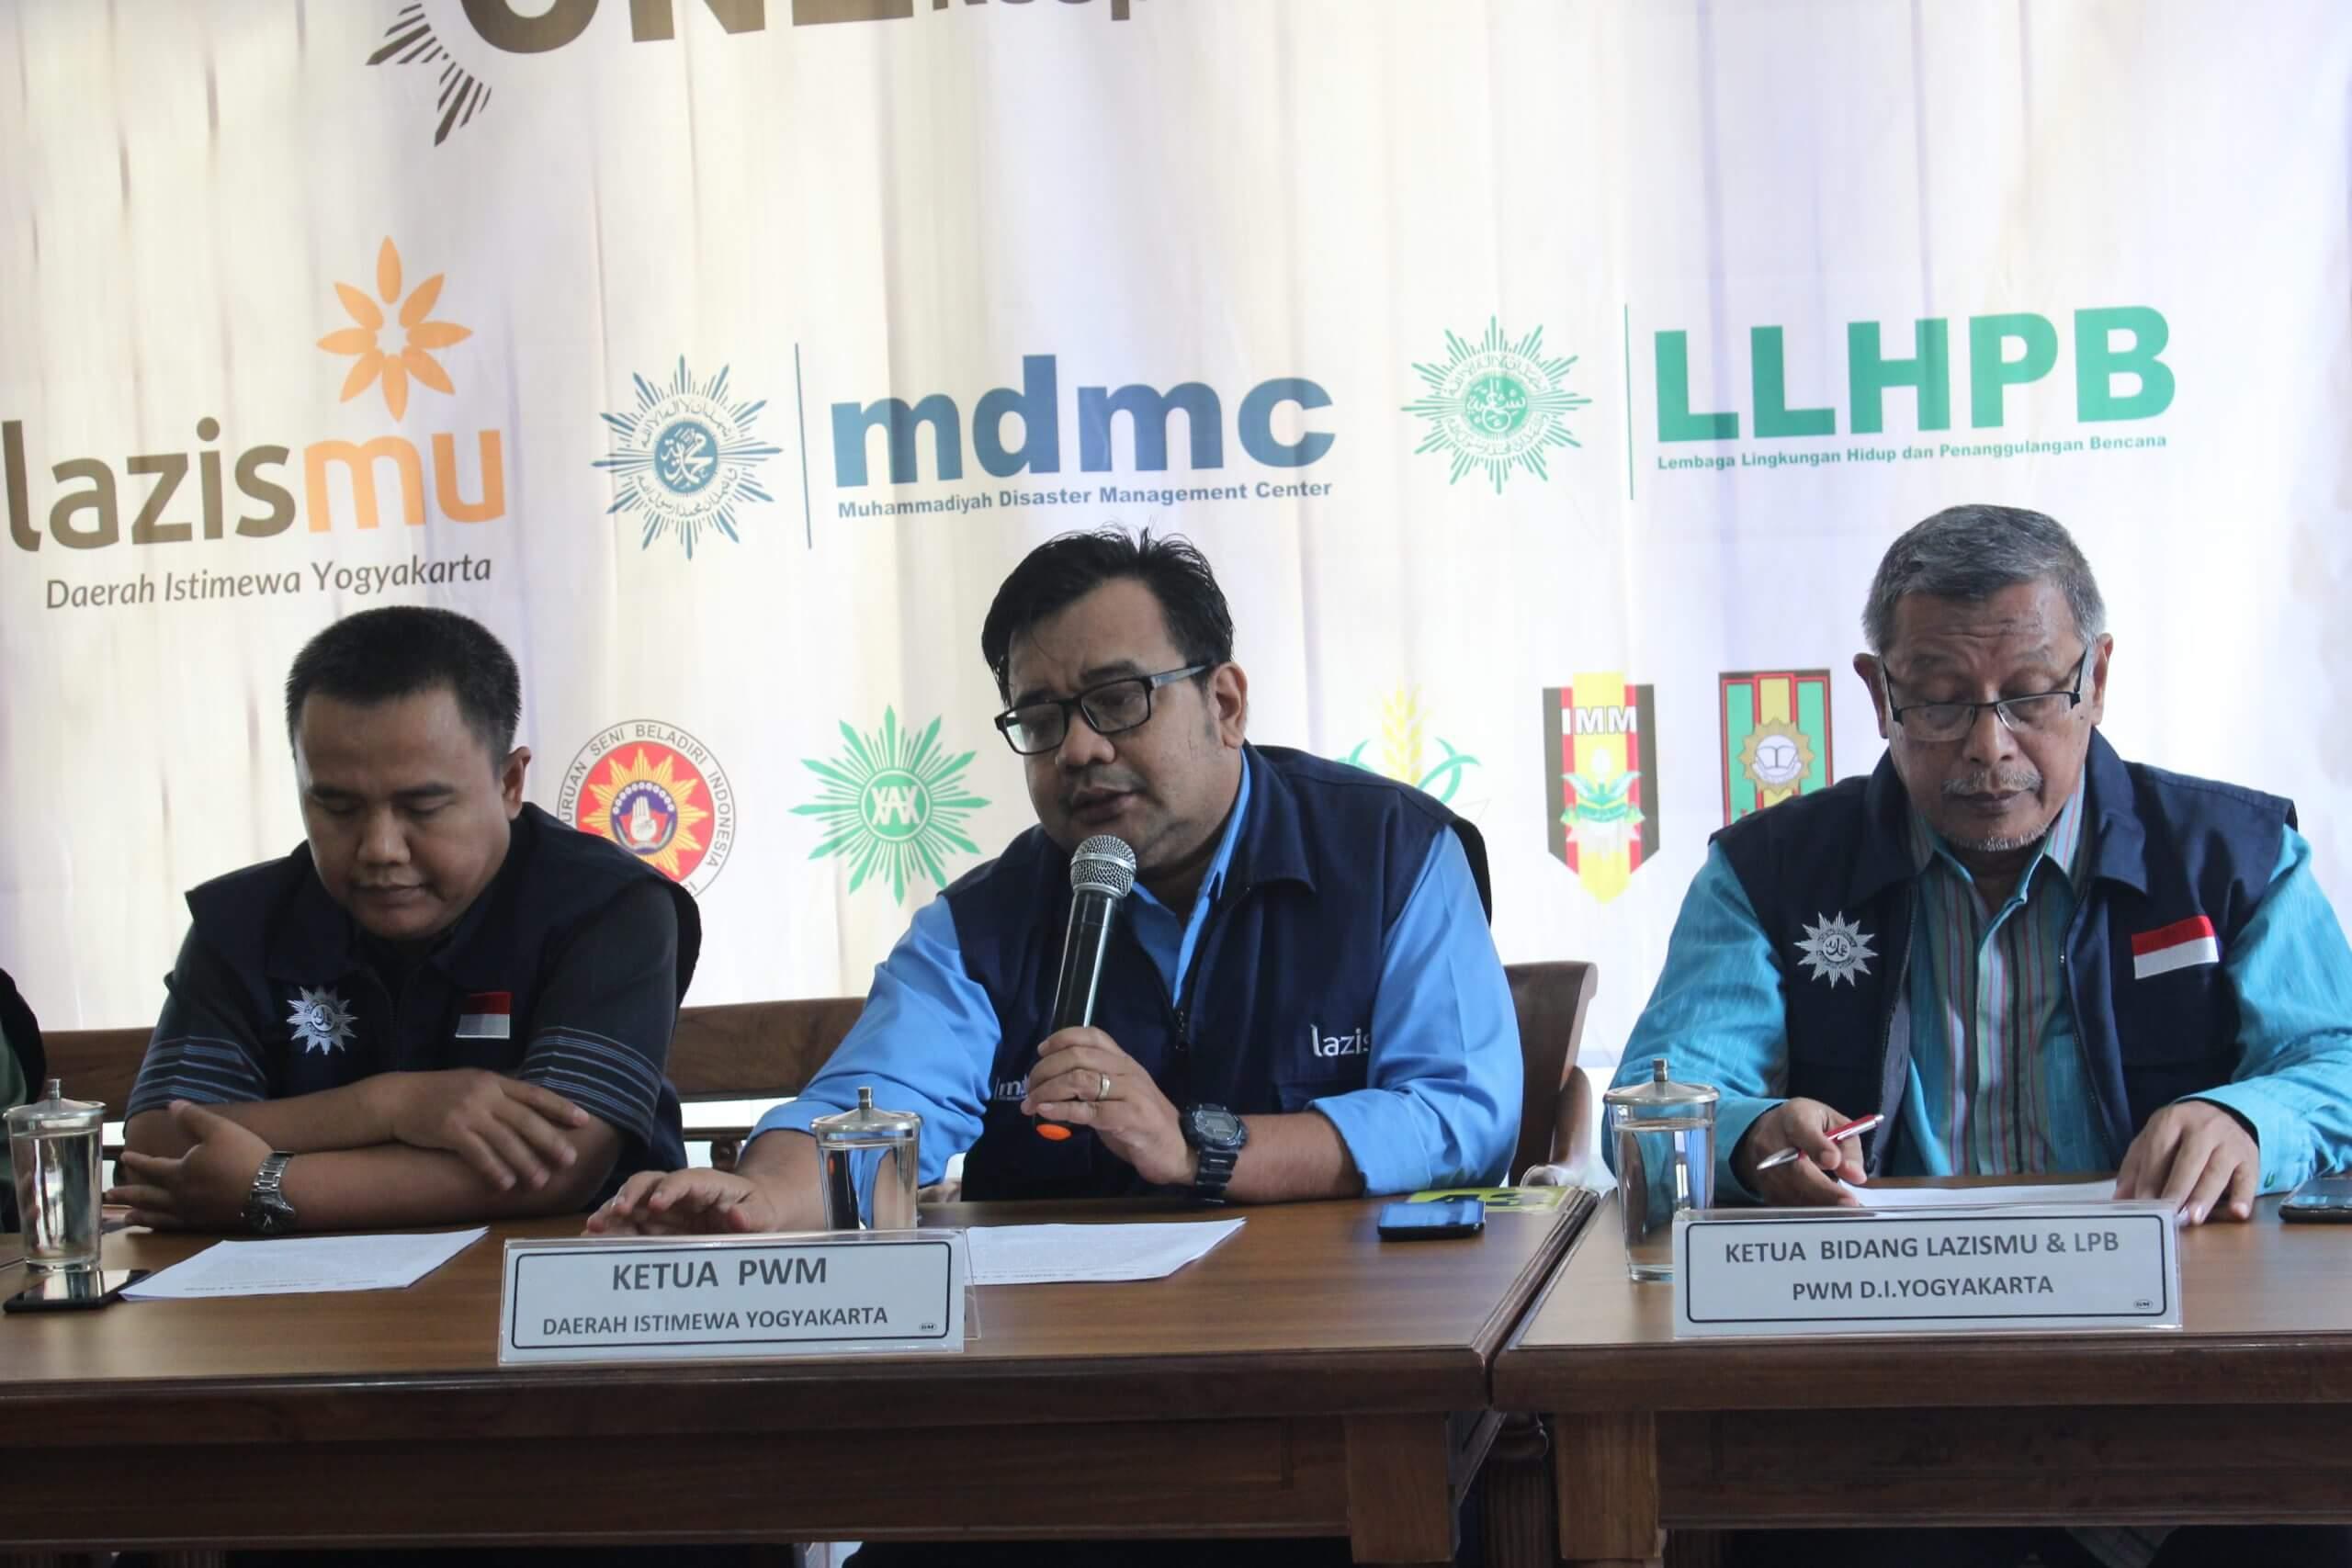 konferensi pres muhammadiyah diy